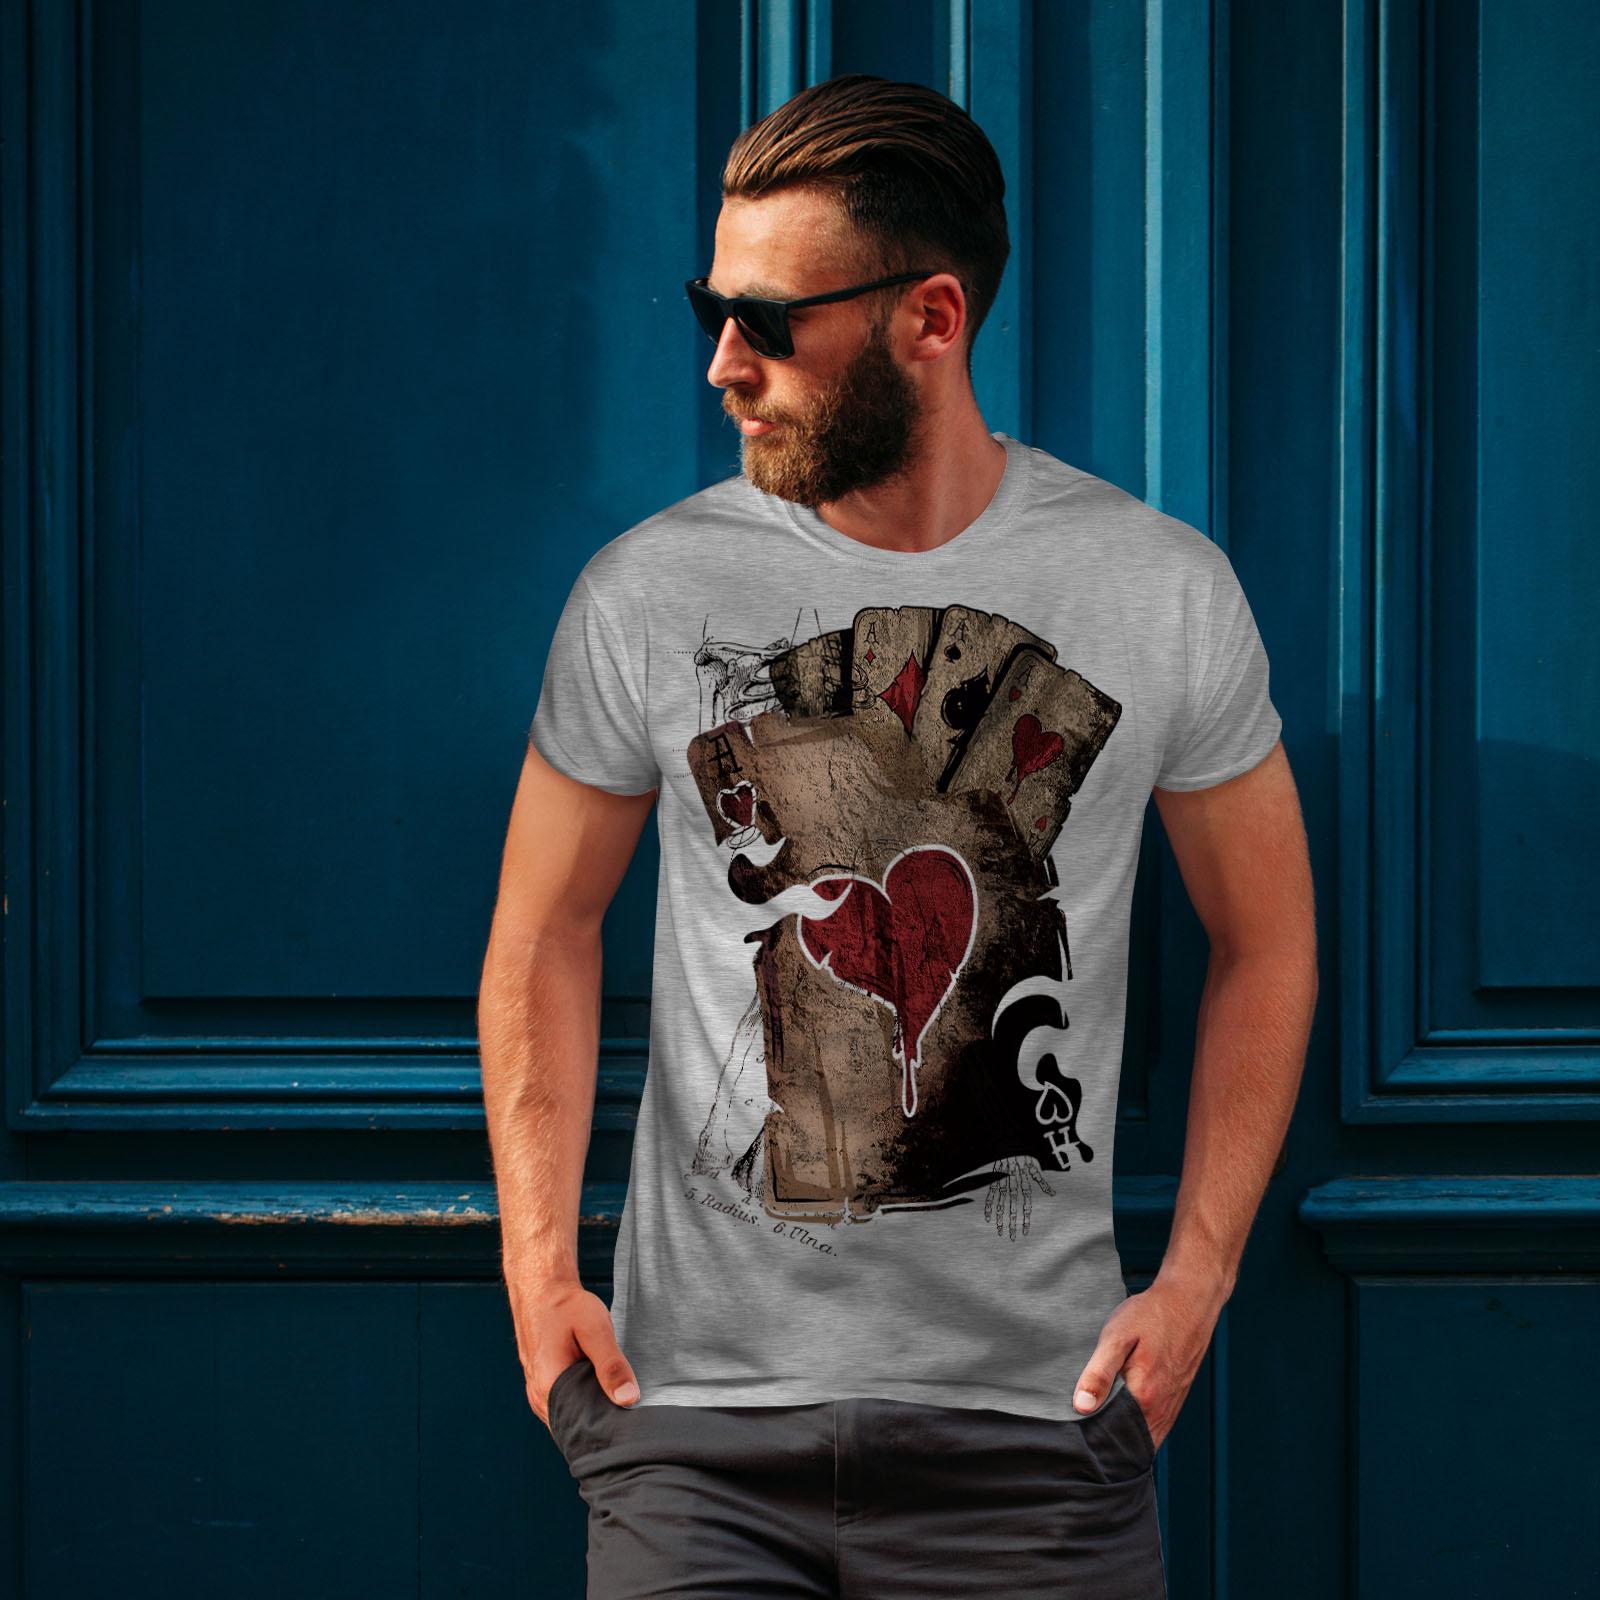 Wellcoda-Poker-Gamble-Squelette-T-shirt-homme-effrayant-conception-graphique-imprime-Tee miniature 16